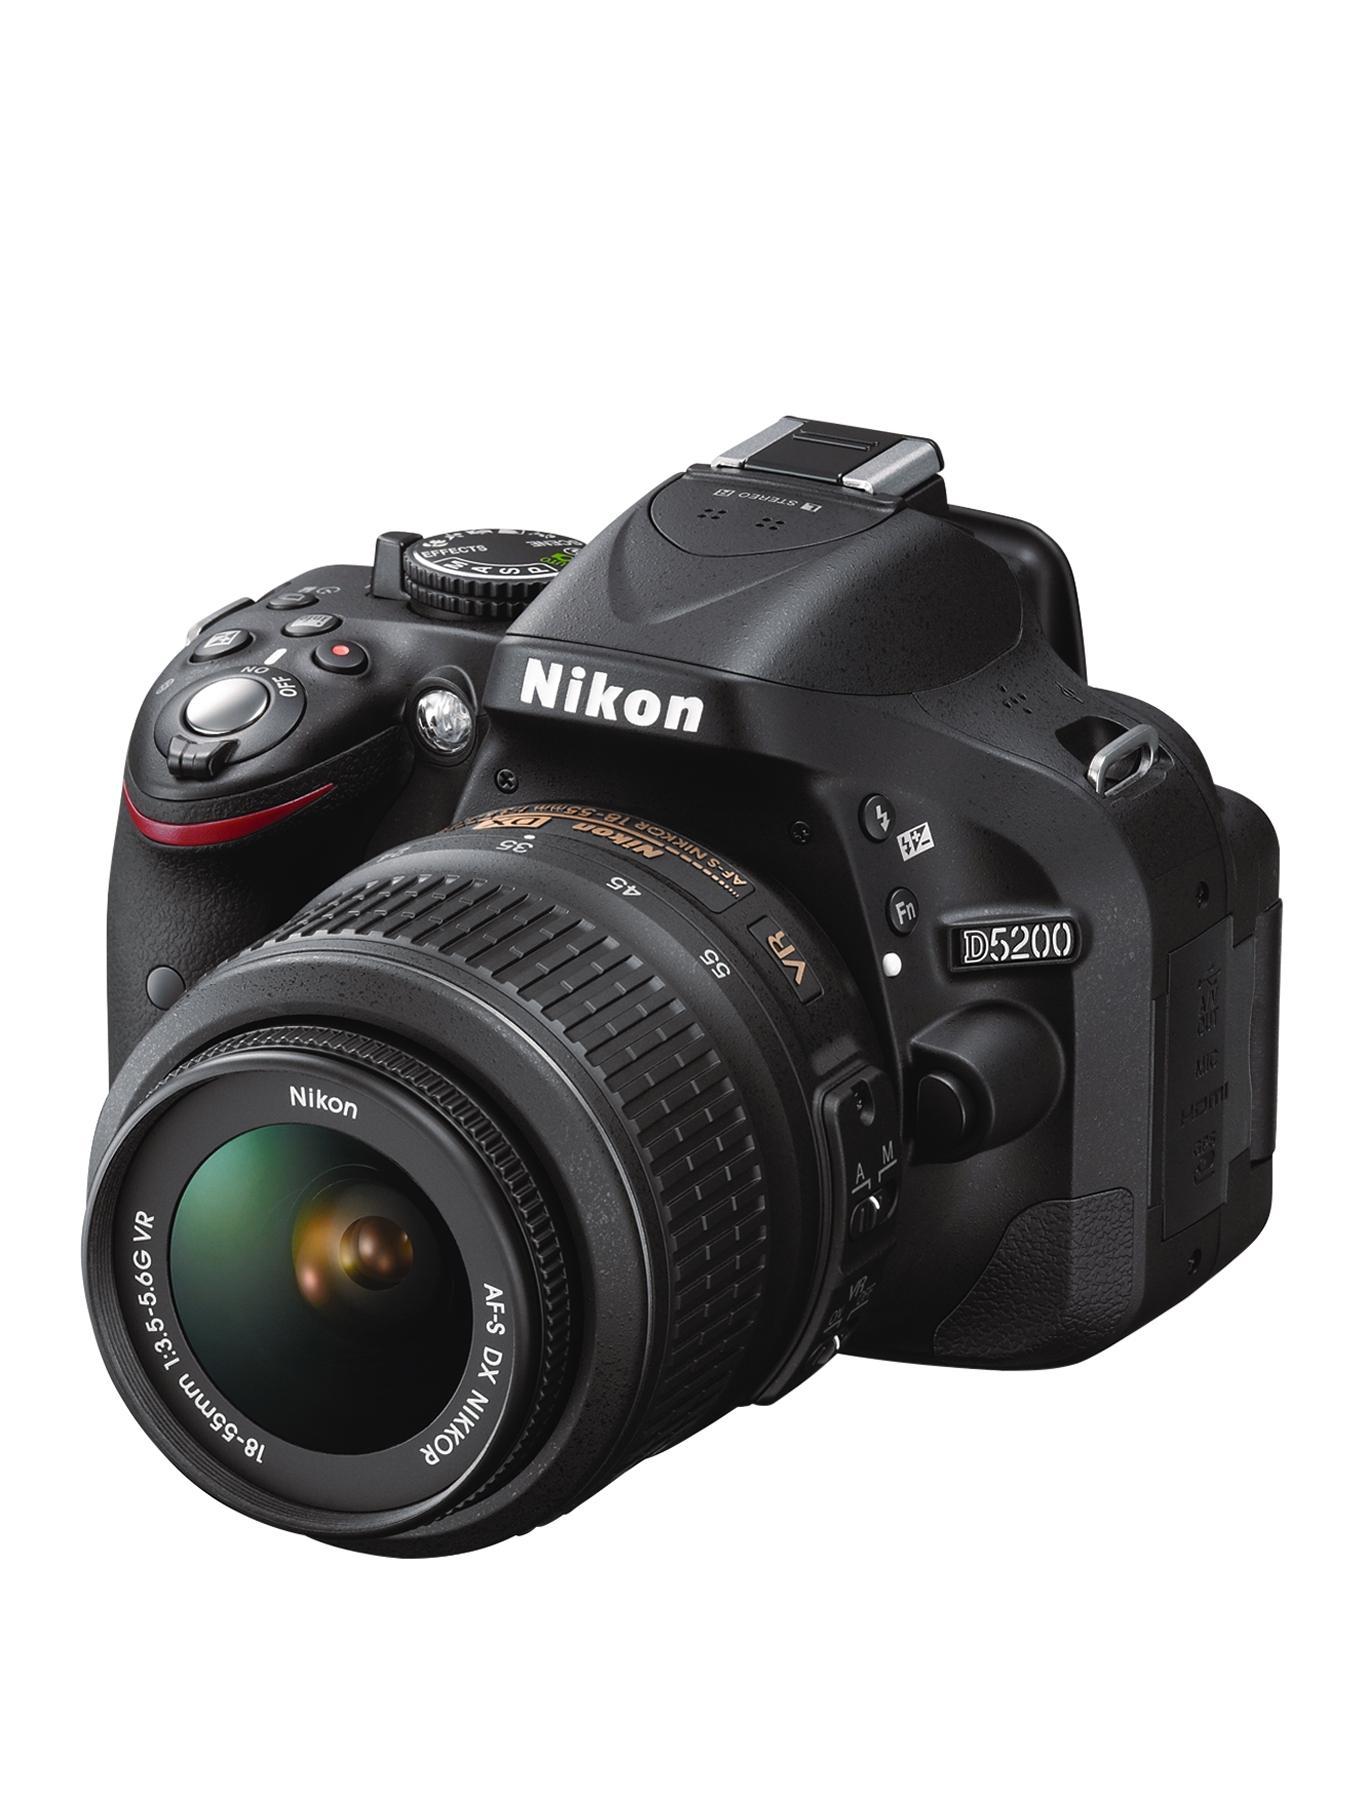 D5200 24.1 Megapixel Digital SLR Camera 18-55mm Lens